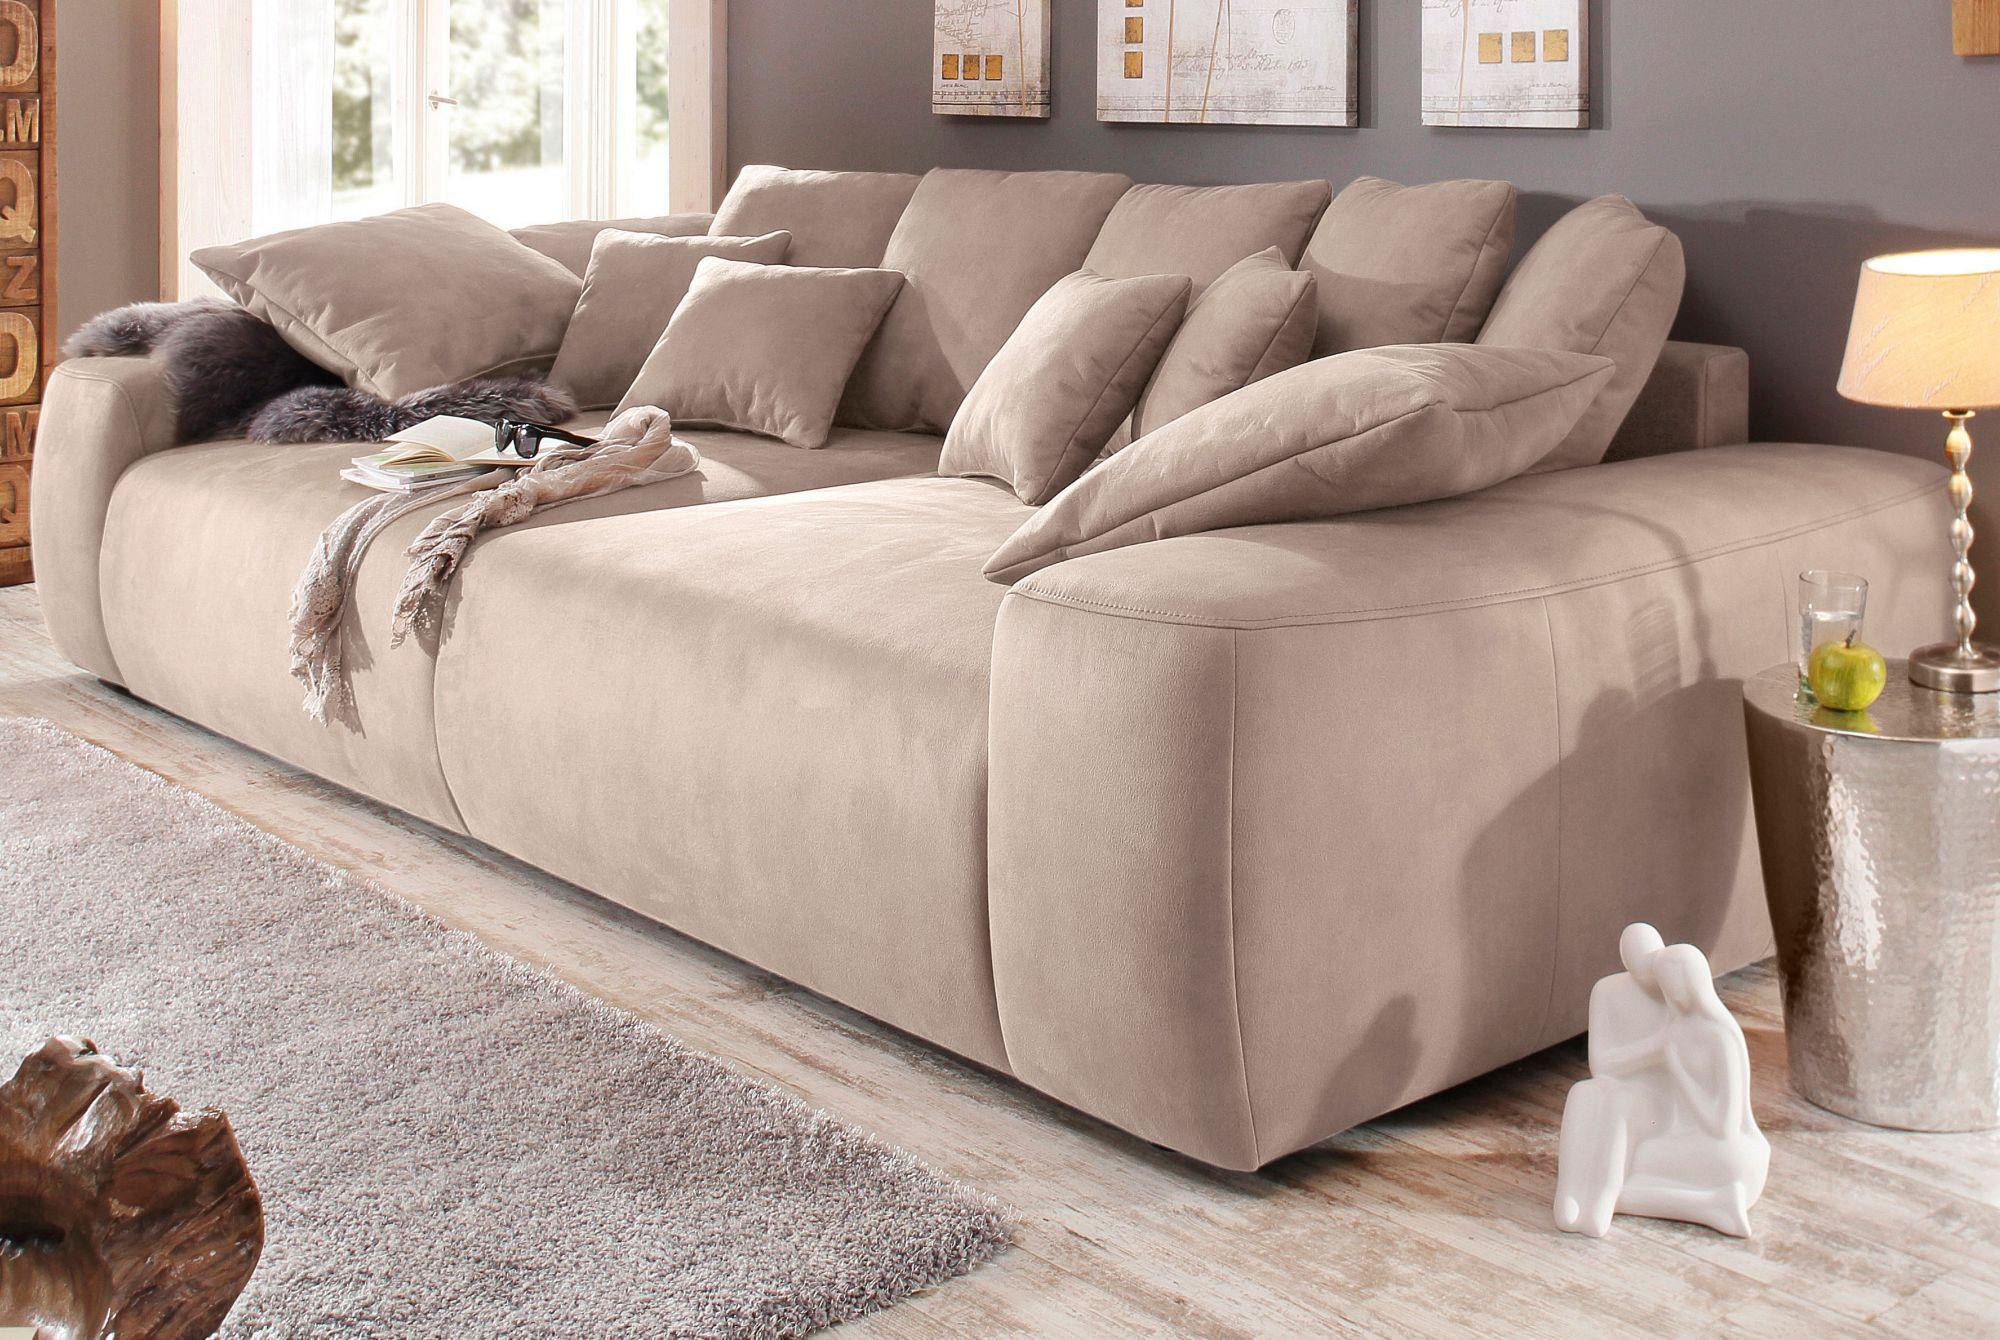 home affaire big sofa glamour schwab versand home affaire. Black Bedroom Furniture Sets. Home Design Ideas